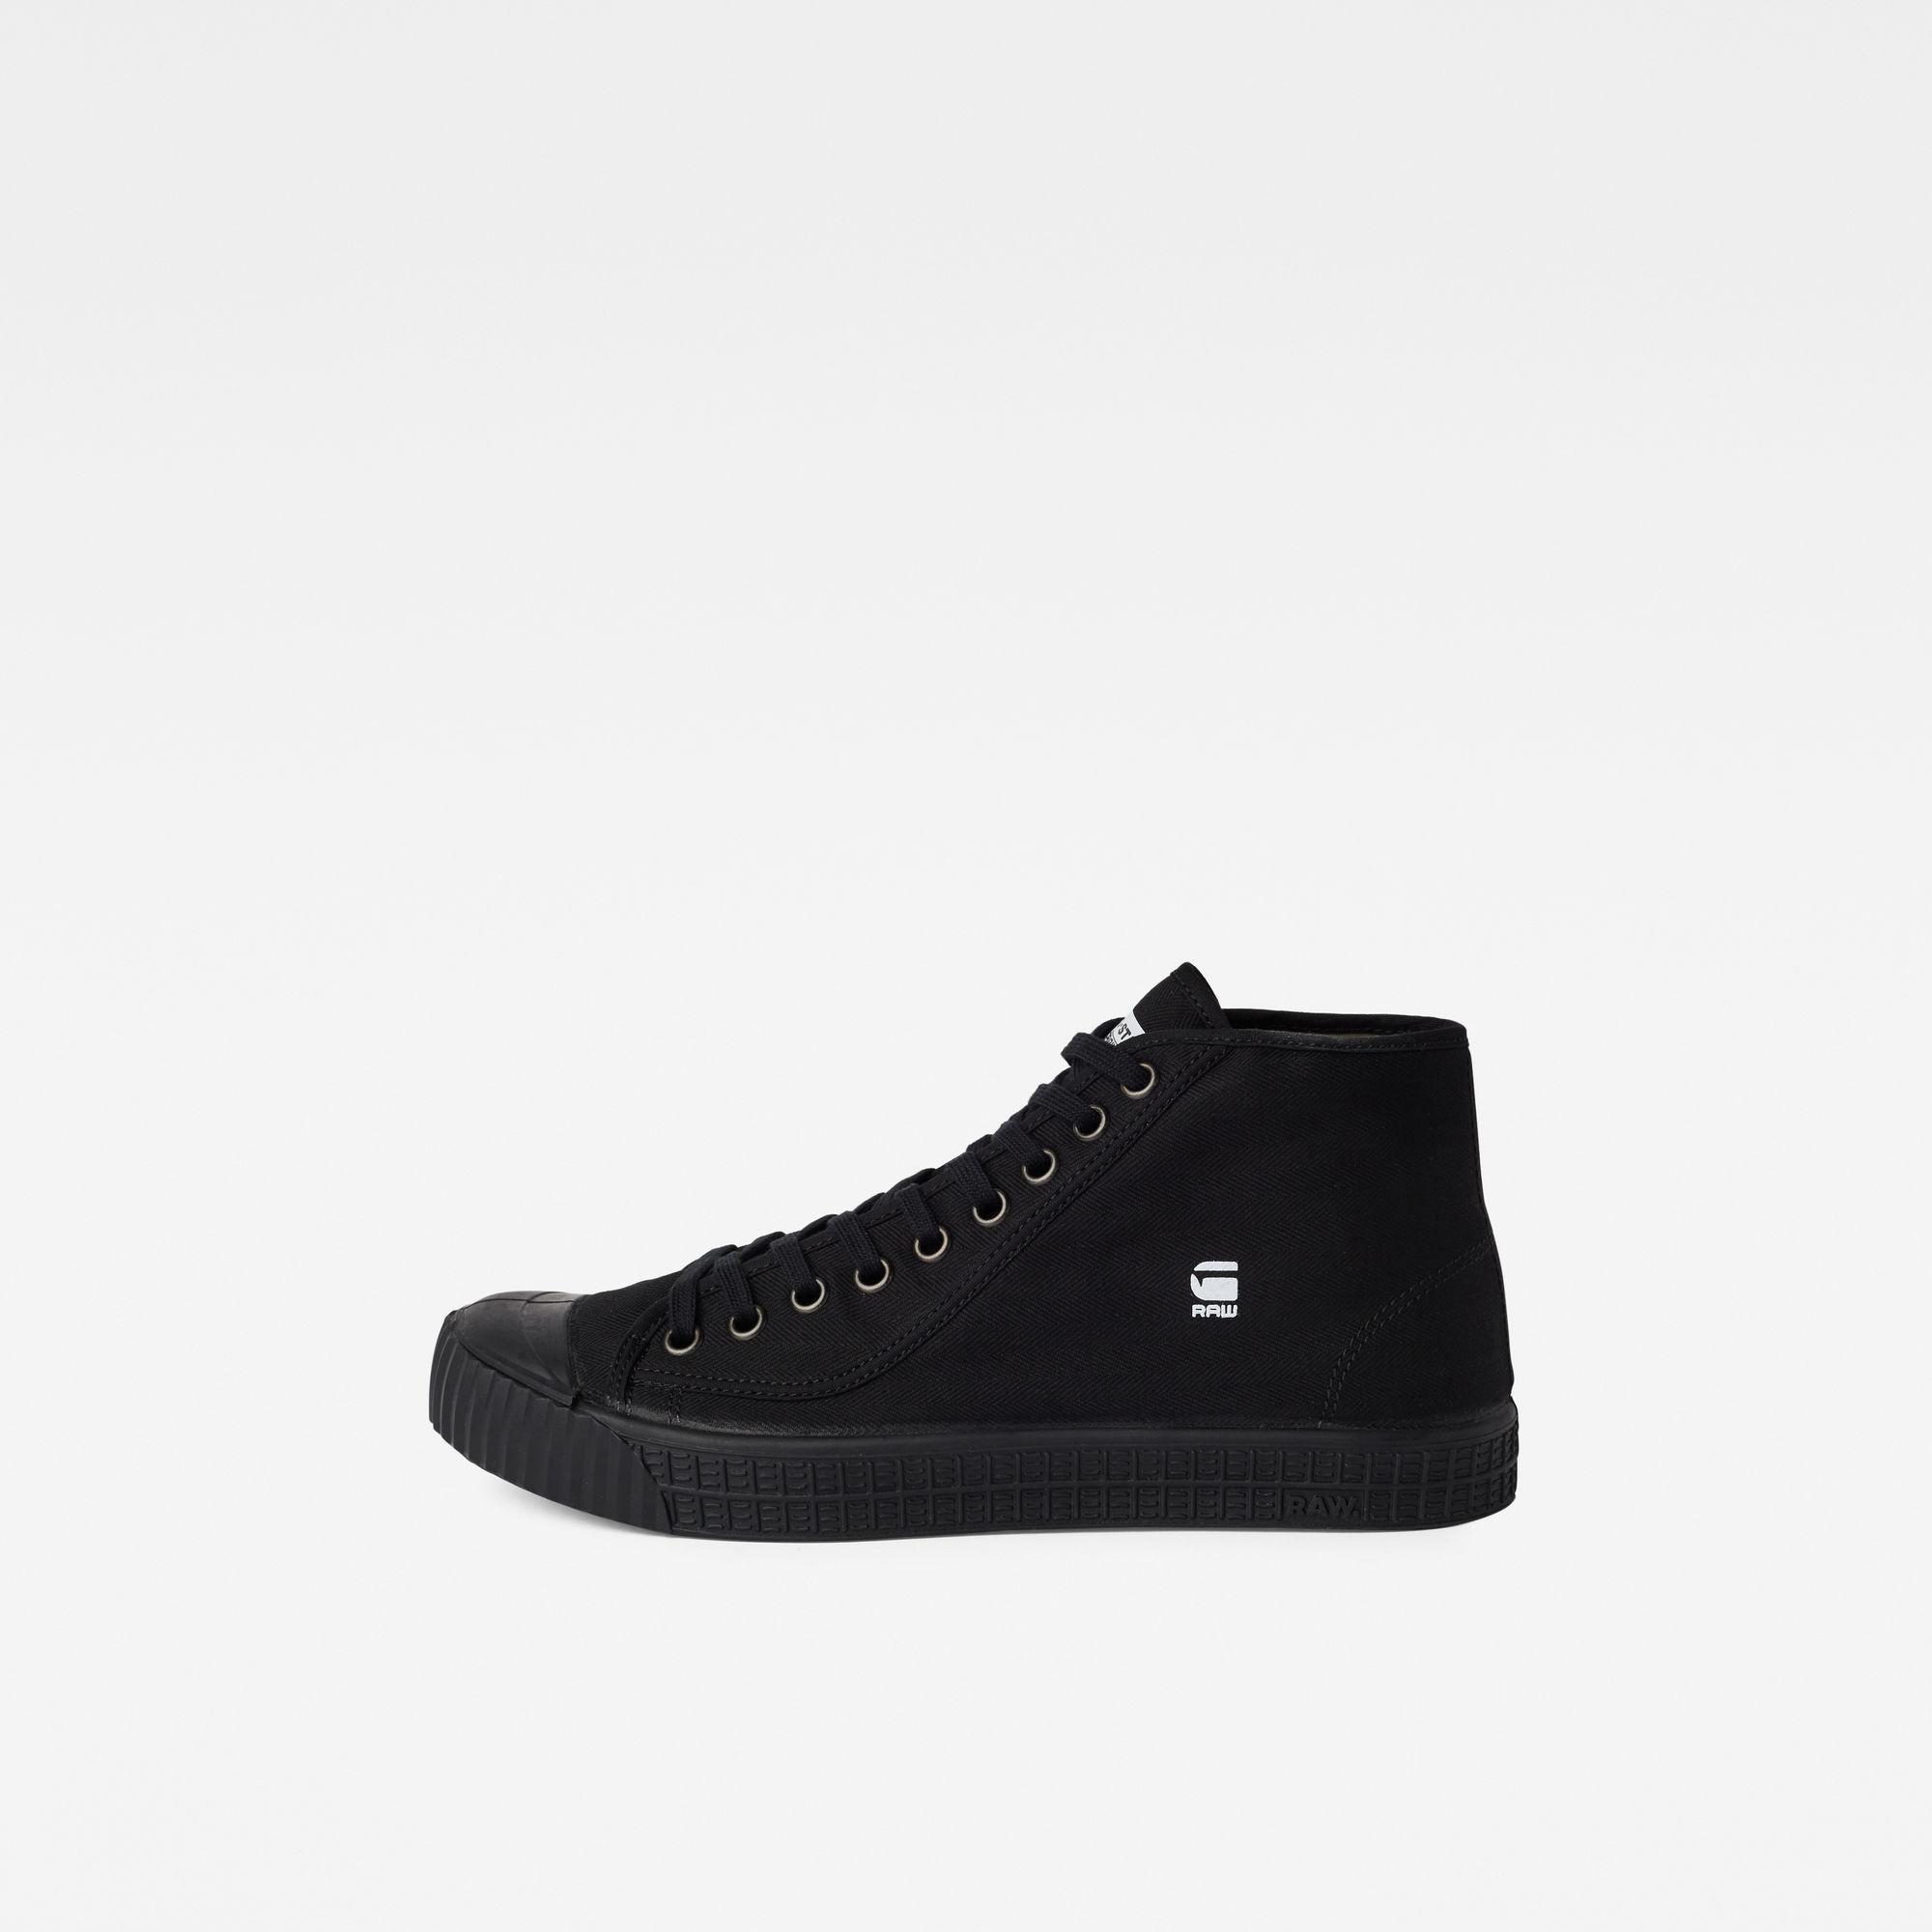 Image of G Star Raw Rovulc Denim Sneakers